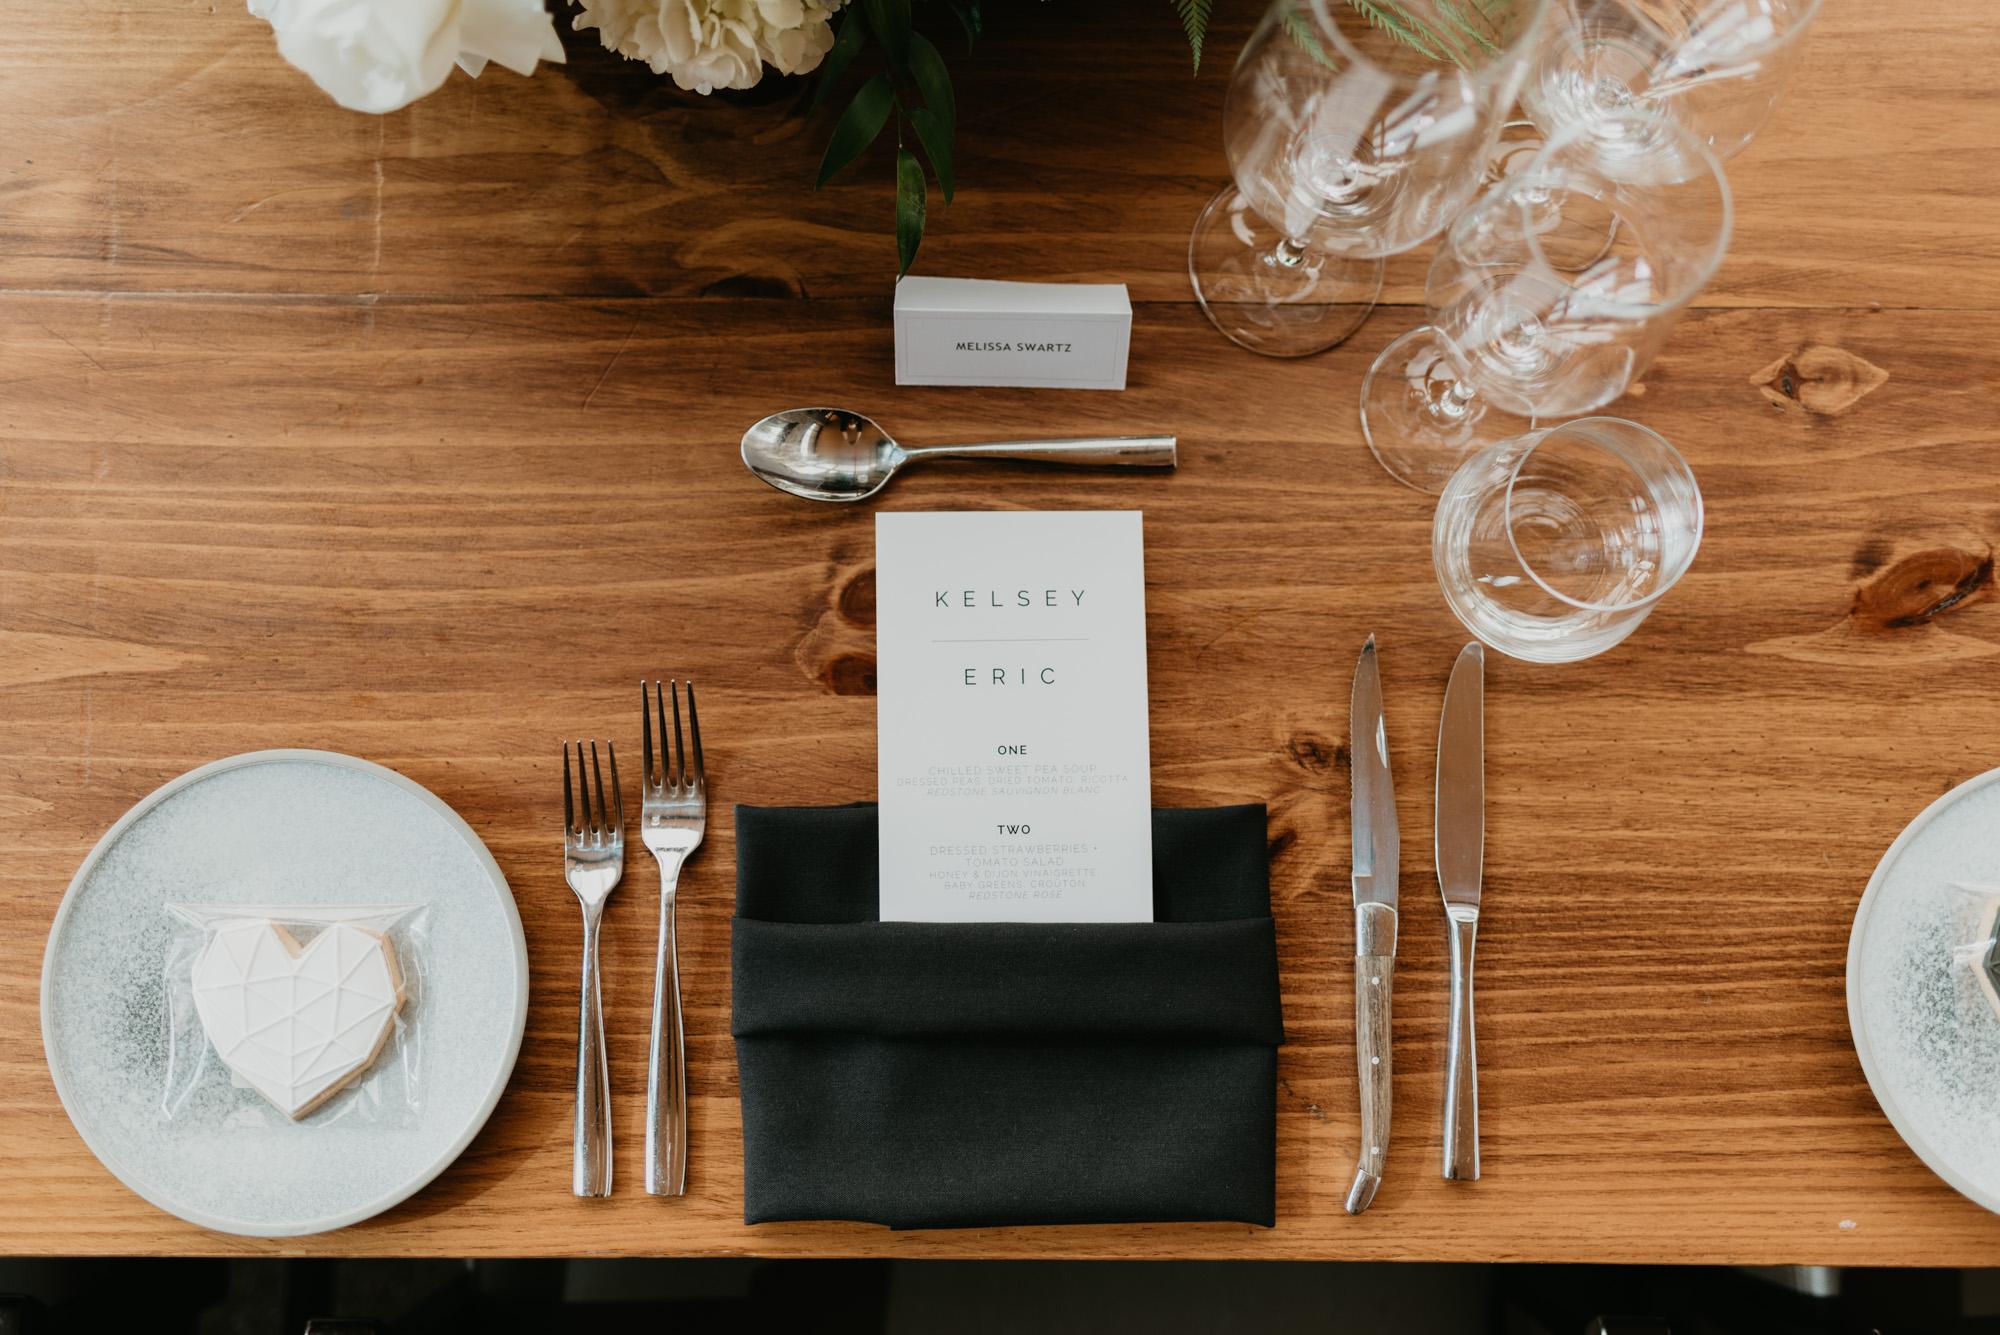 vineyard-bride-robin-sassi-outdoor-summer-wedding-redstone-winery-niagara-toronto-vendor-0025.JPG